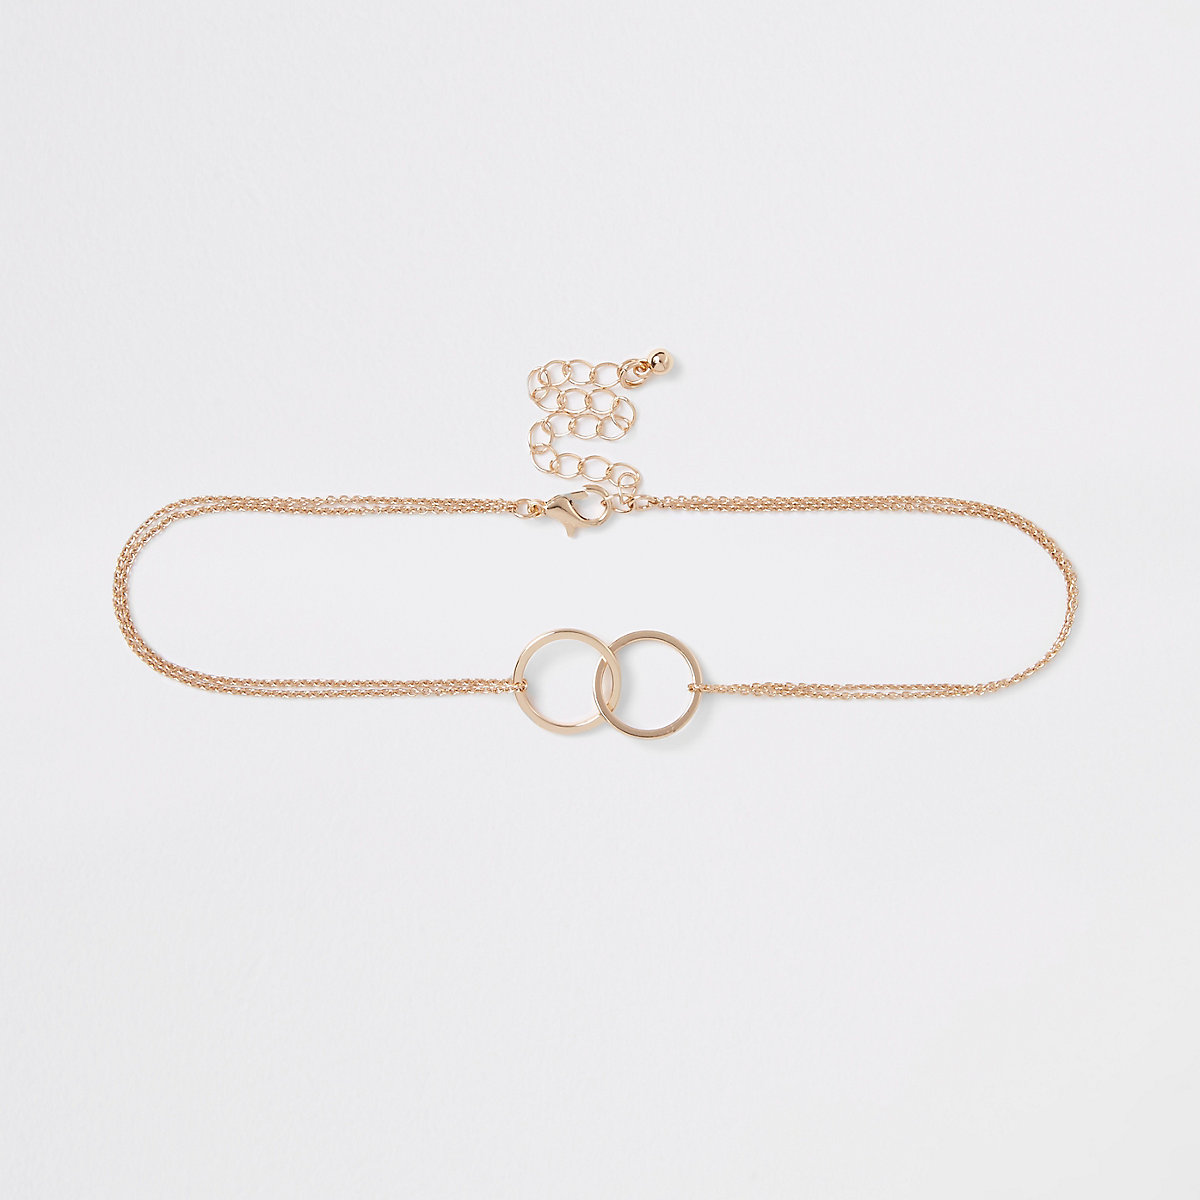 Gold tone chain interlink circle choker